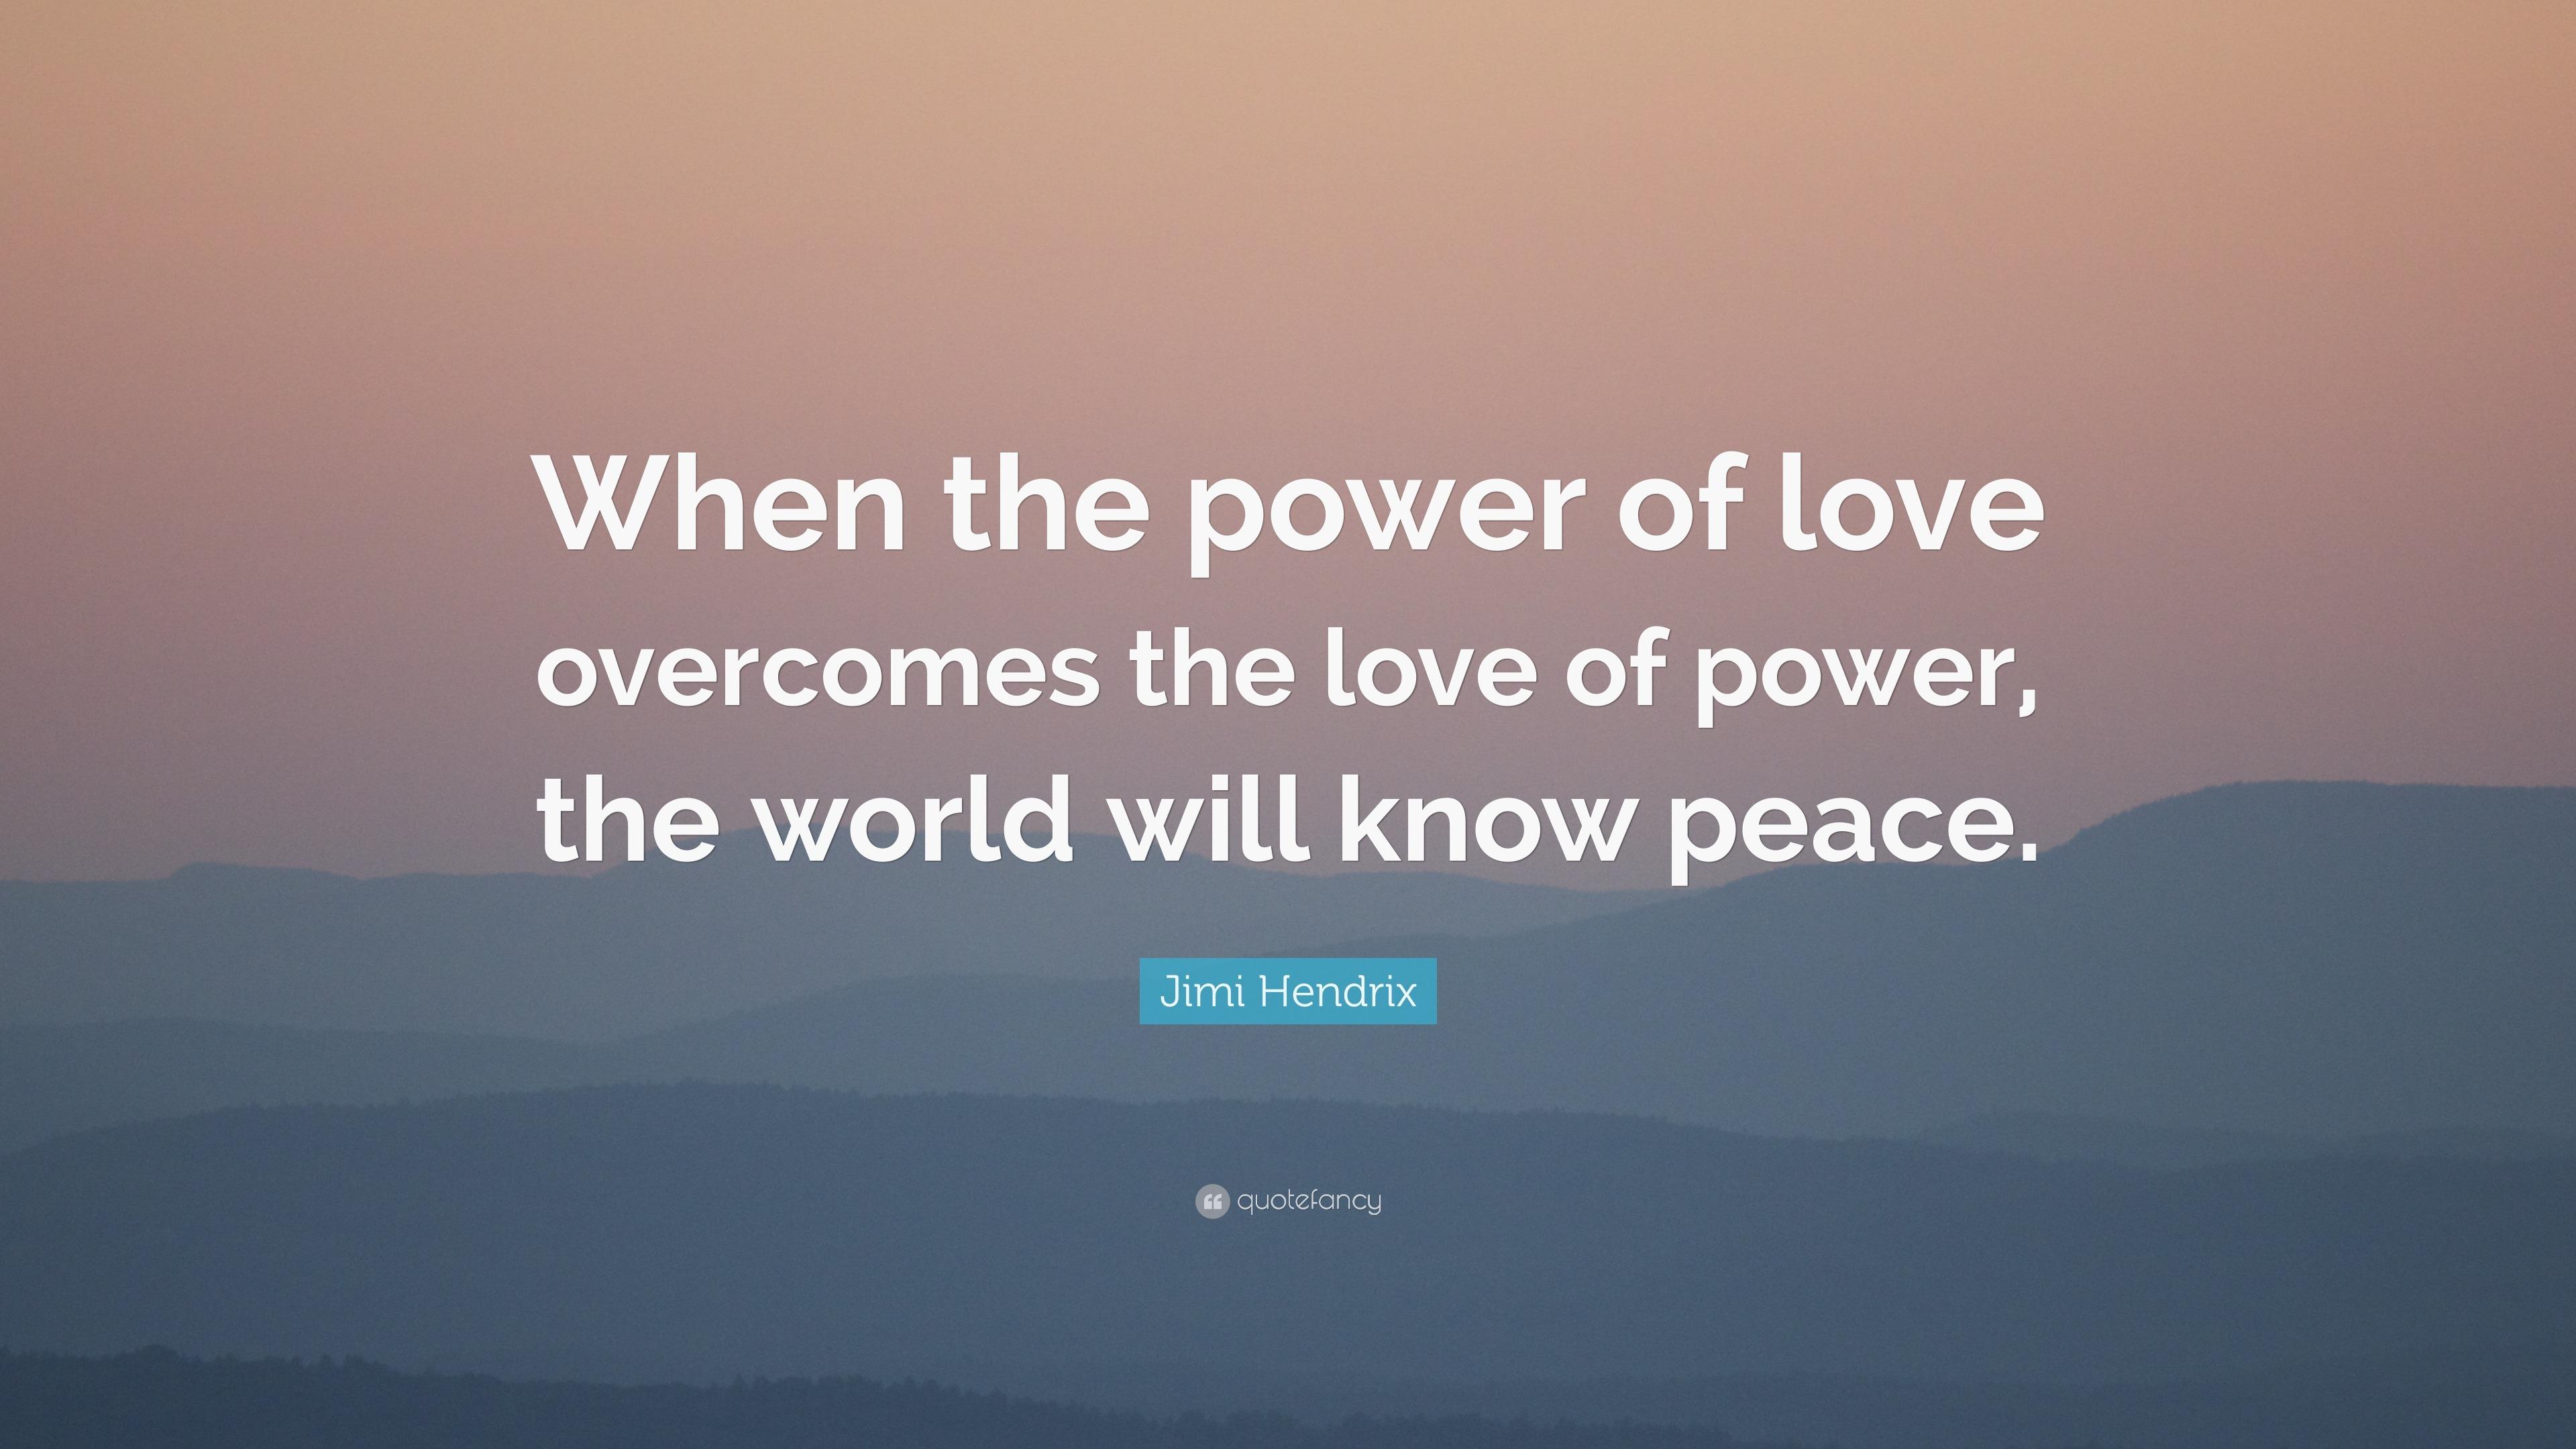 Hippie Longstockings L The Power Of Lovehendrix